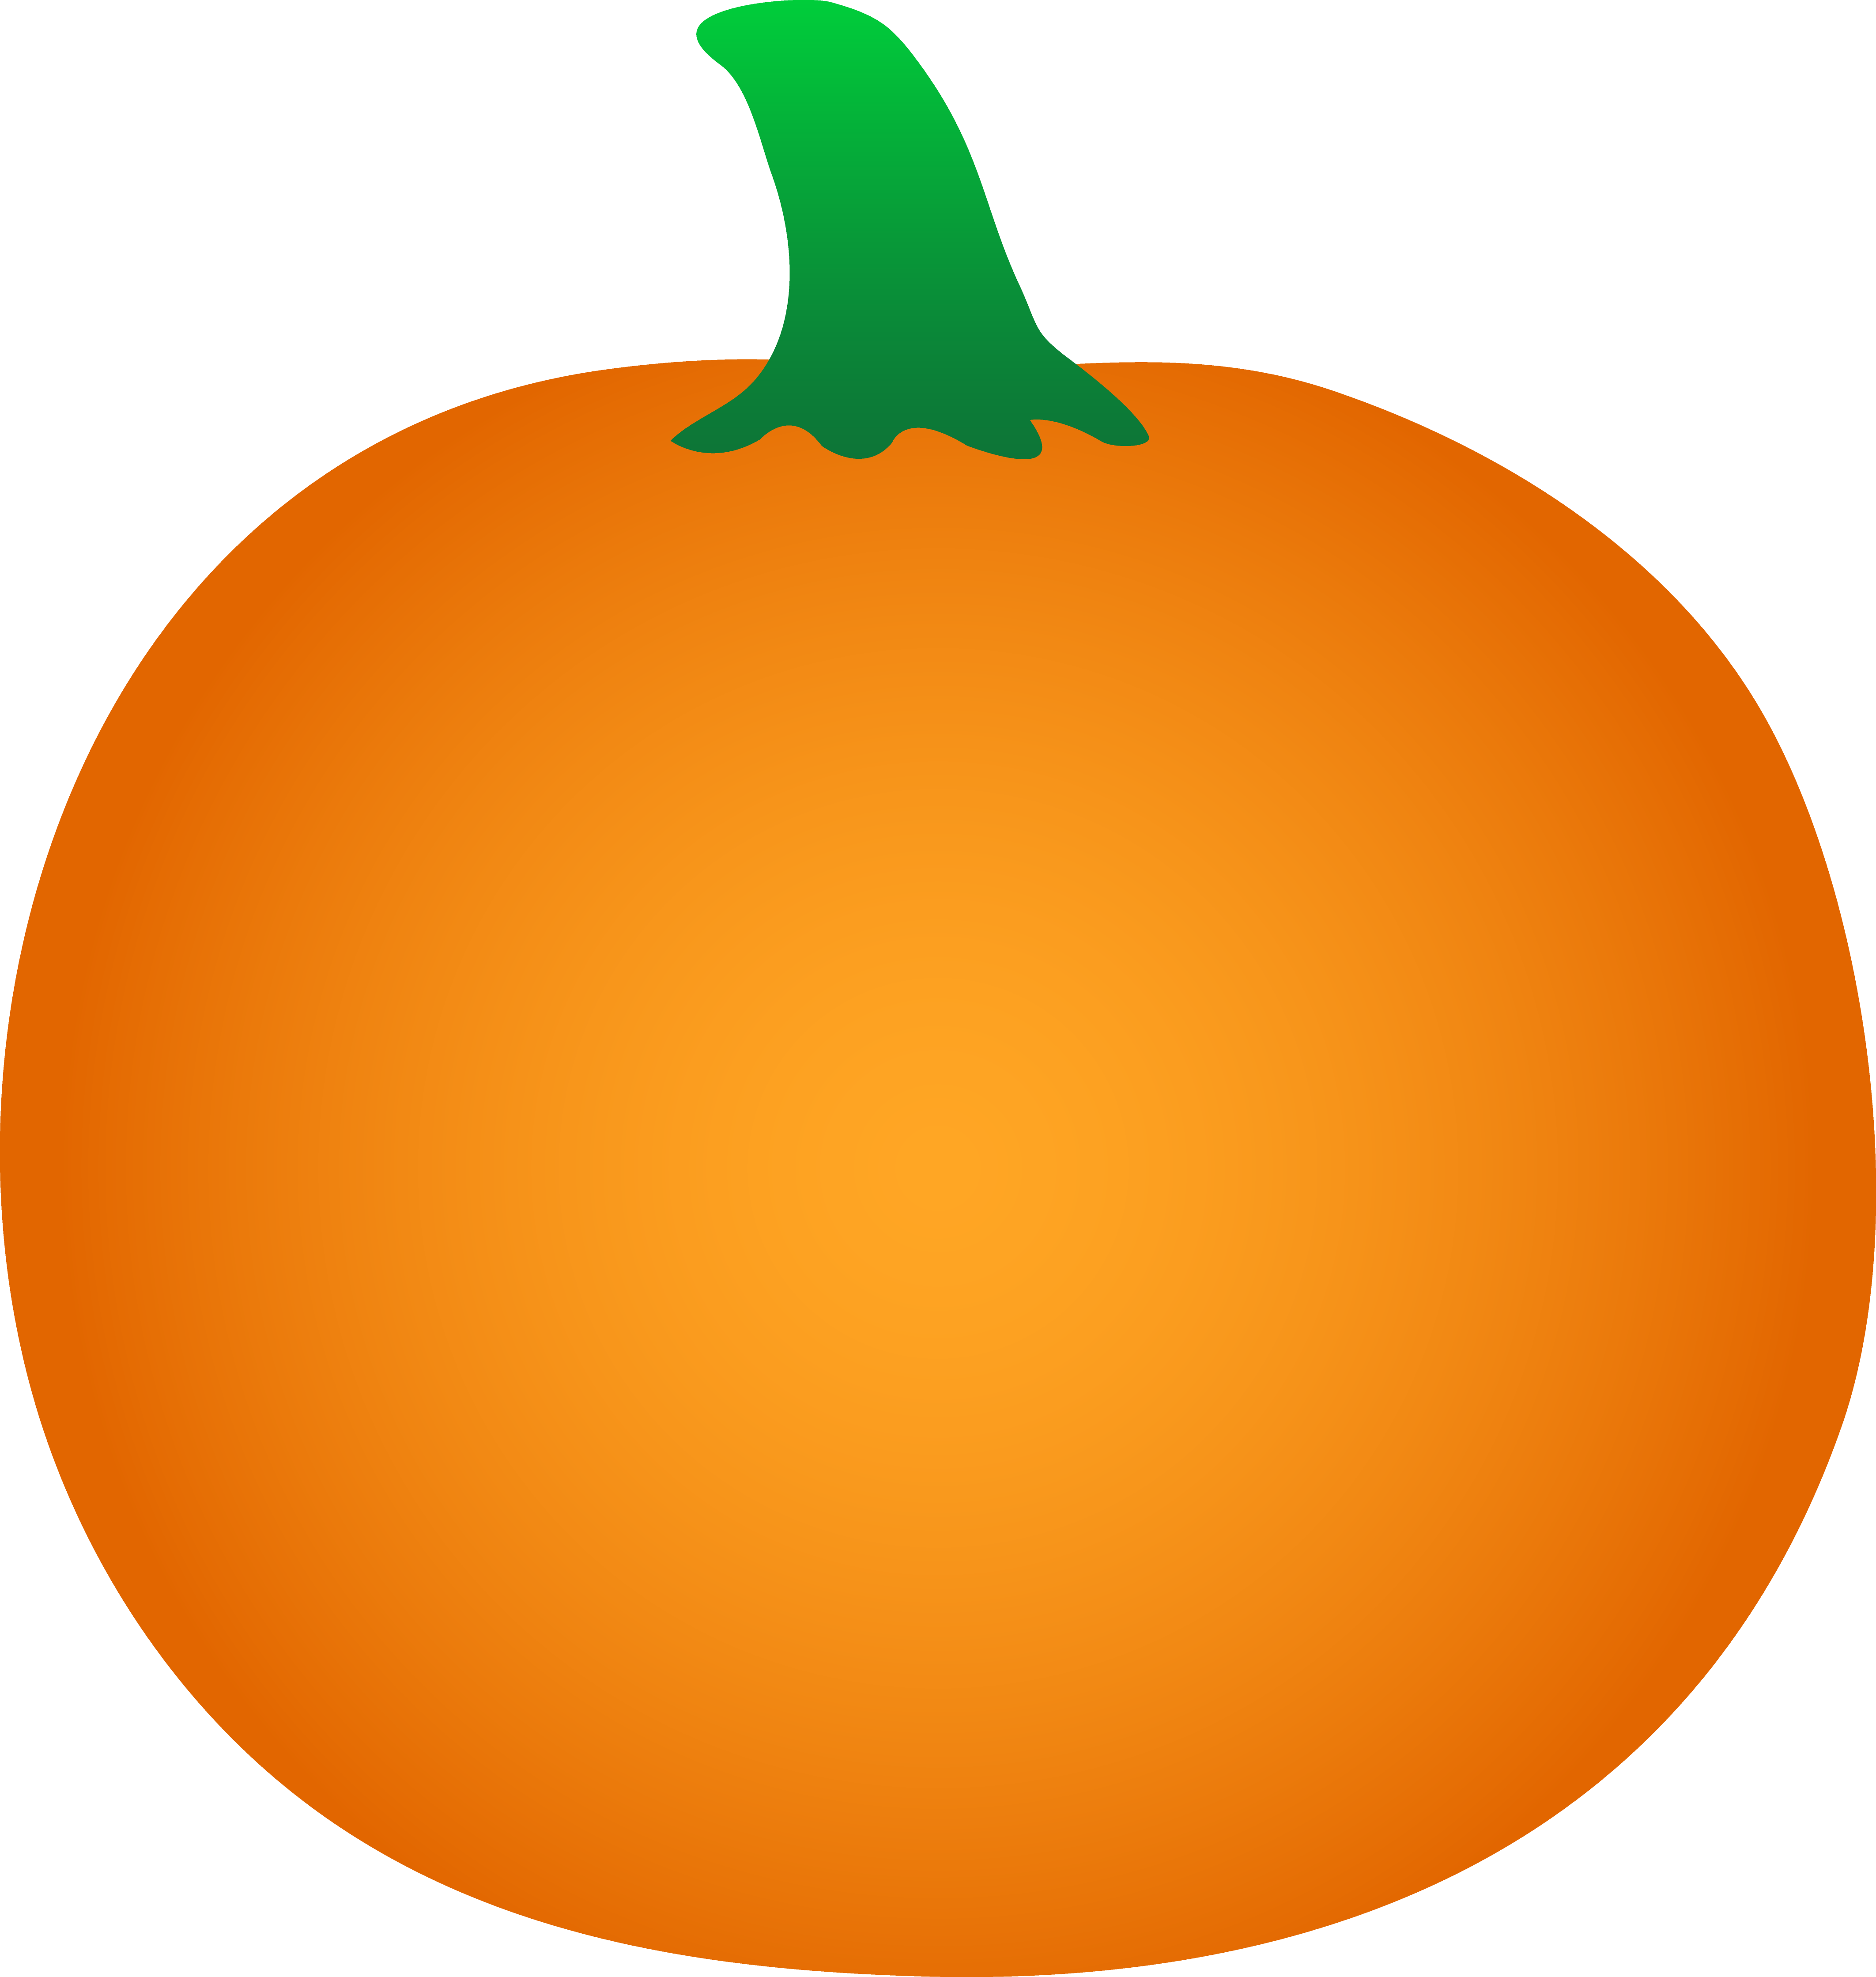 6 Images of Free Printable Orange Pumpkin